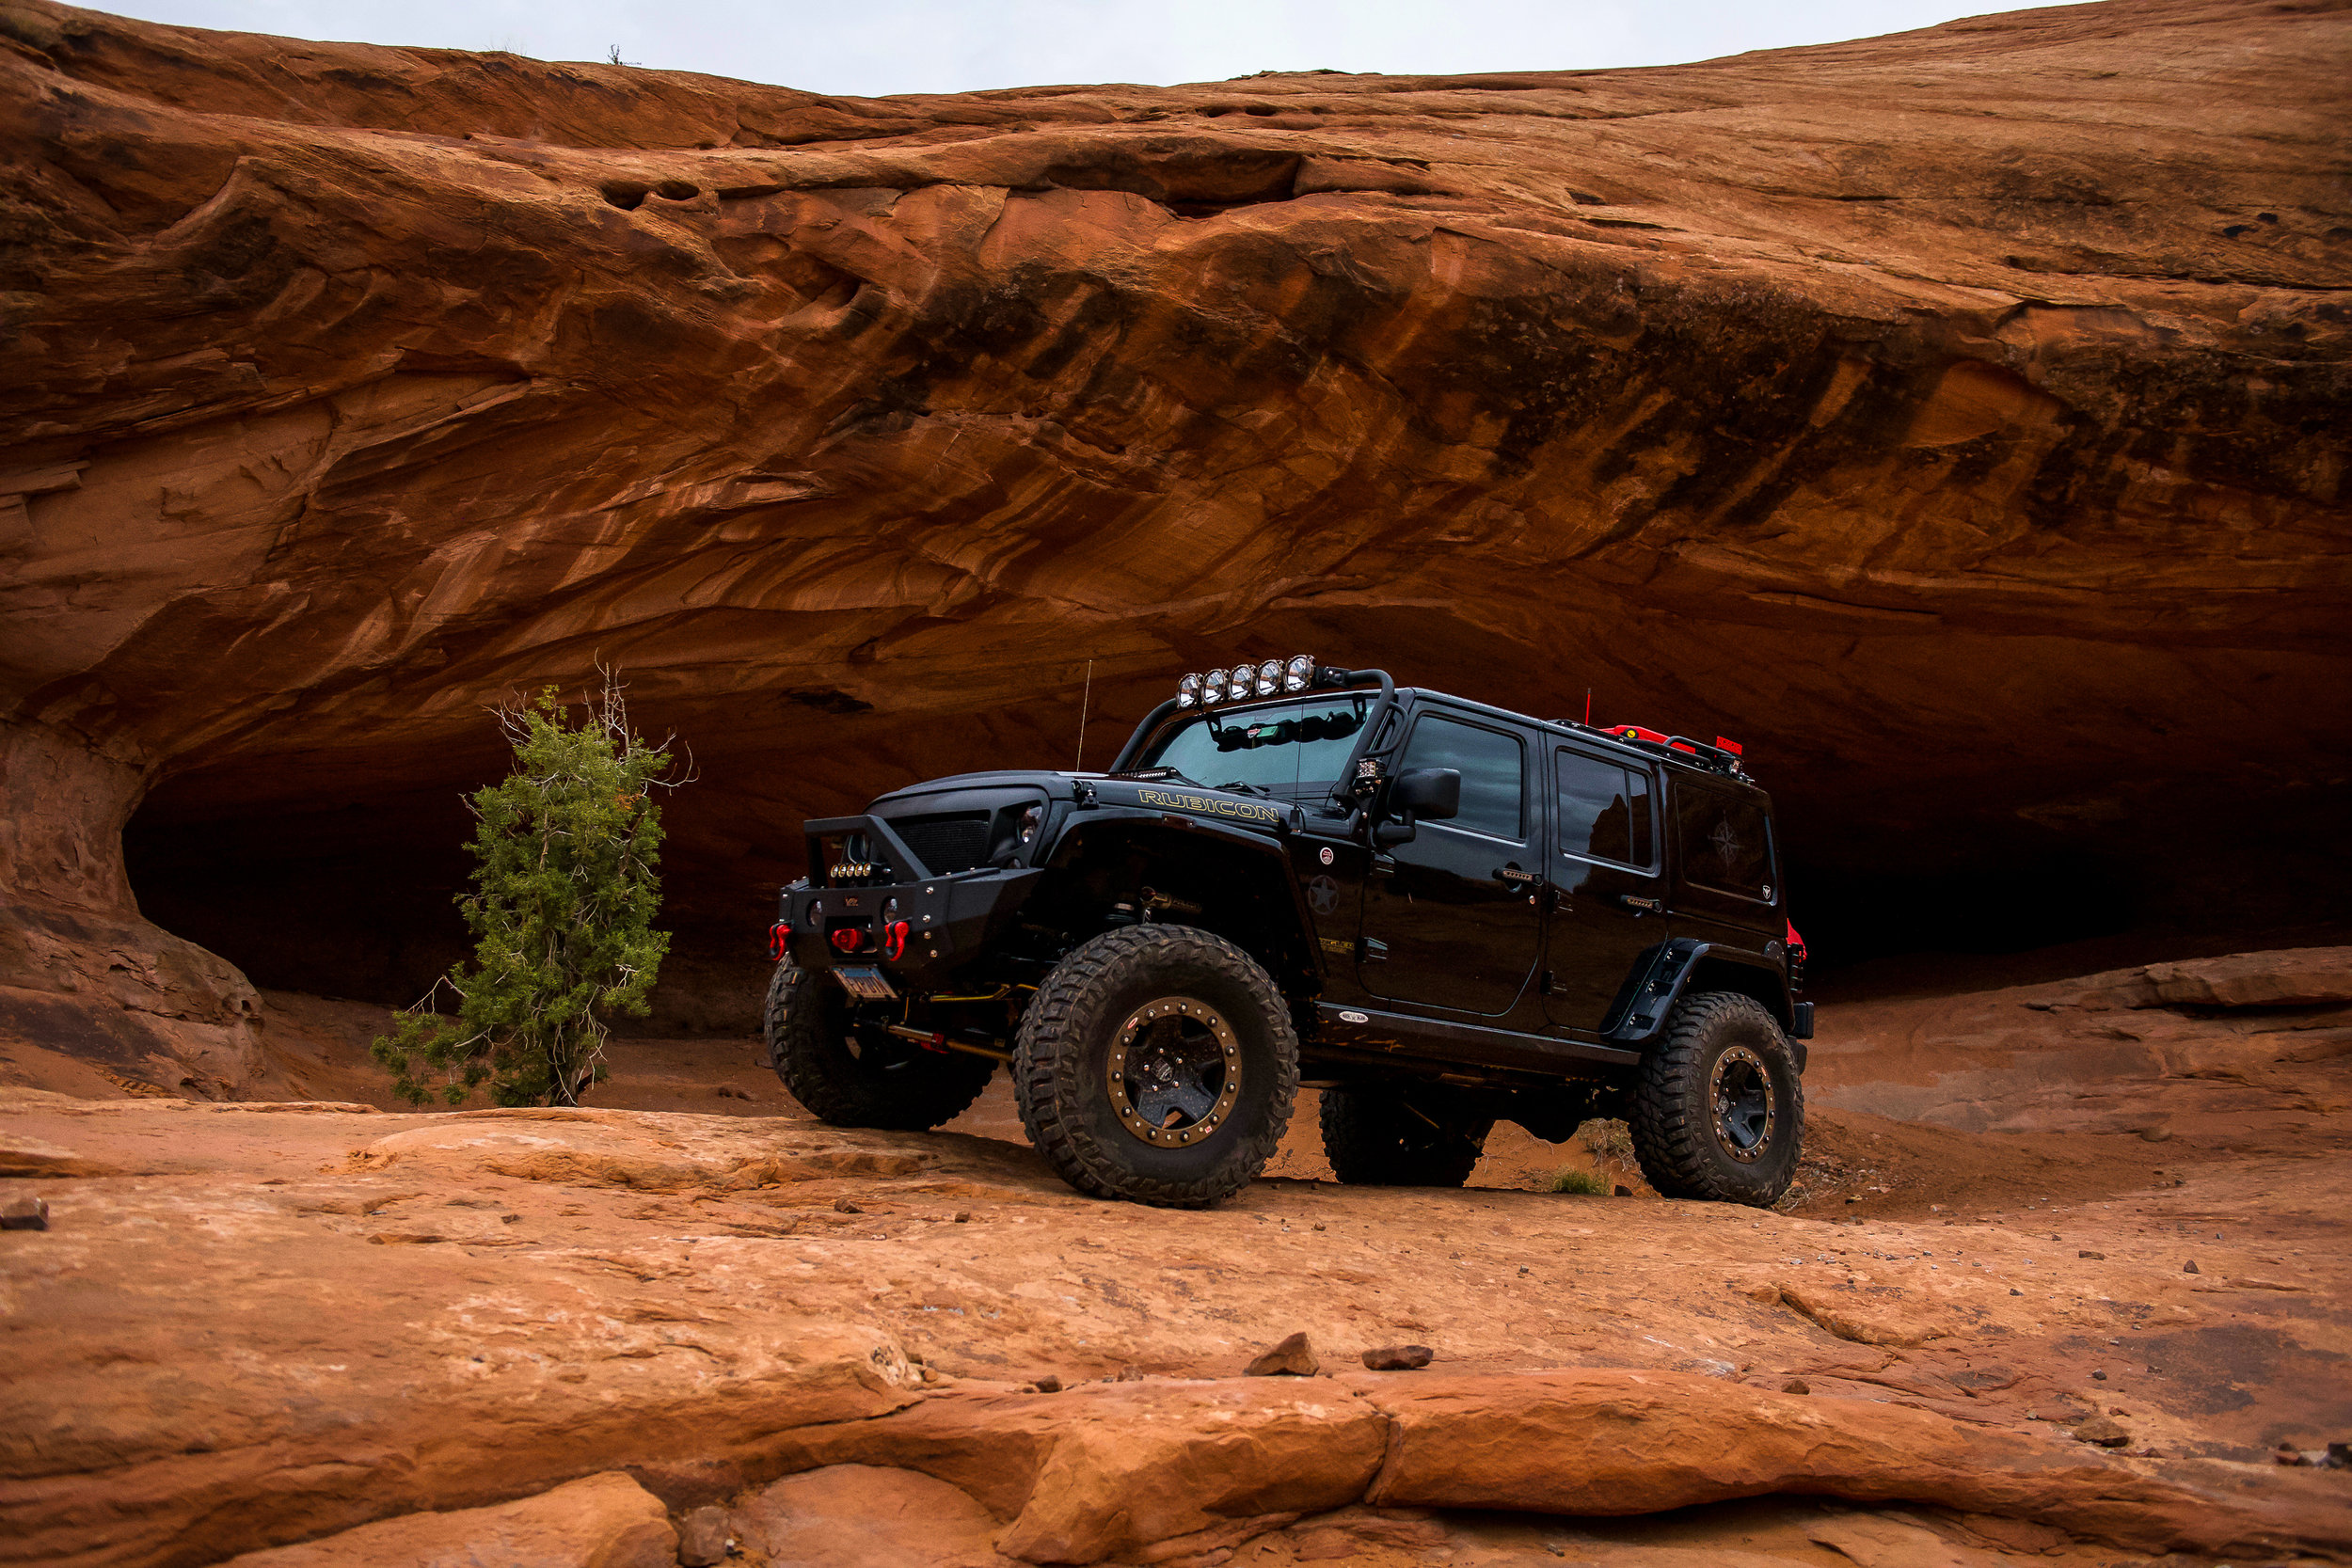 On Golden Spike Trail, Moab